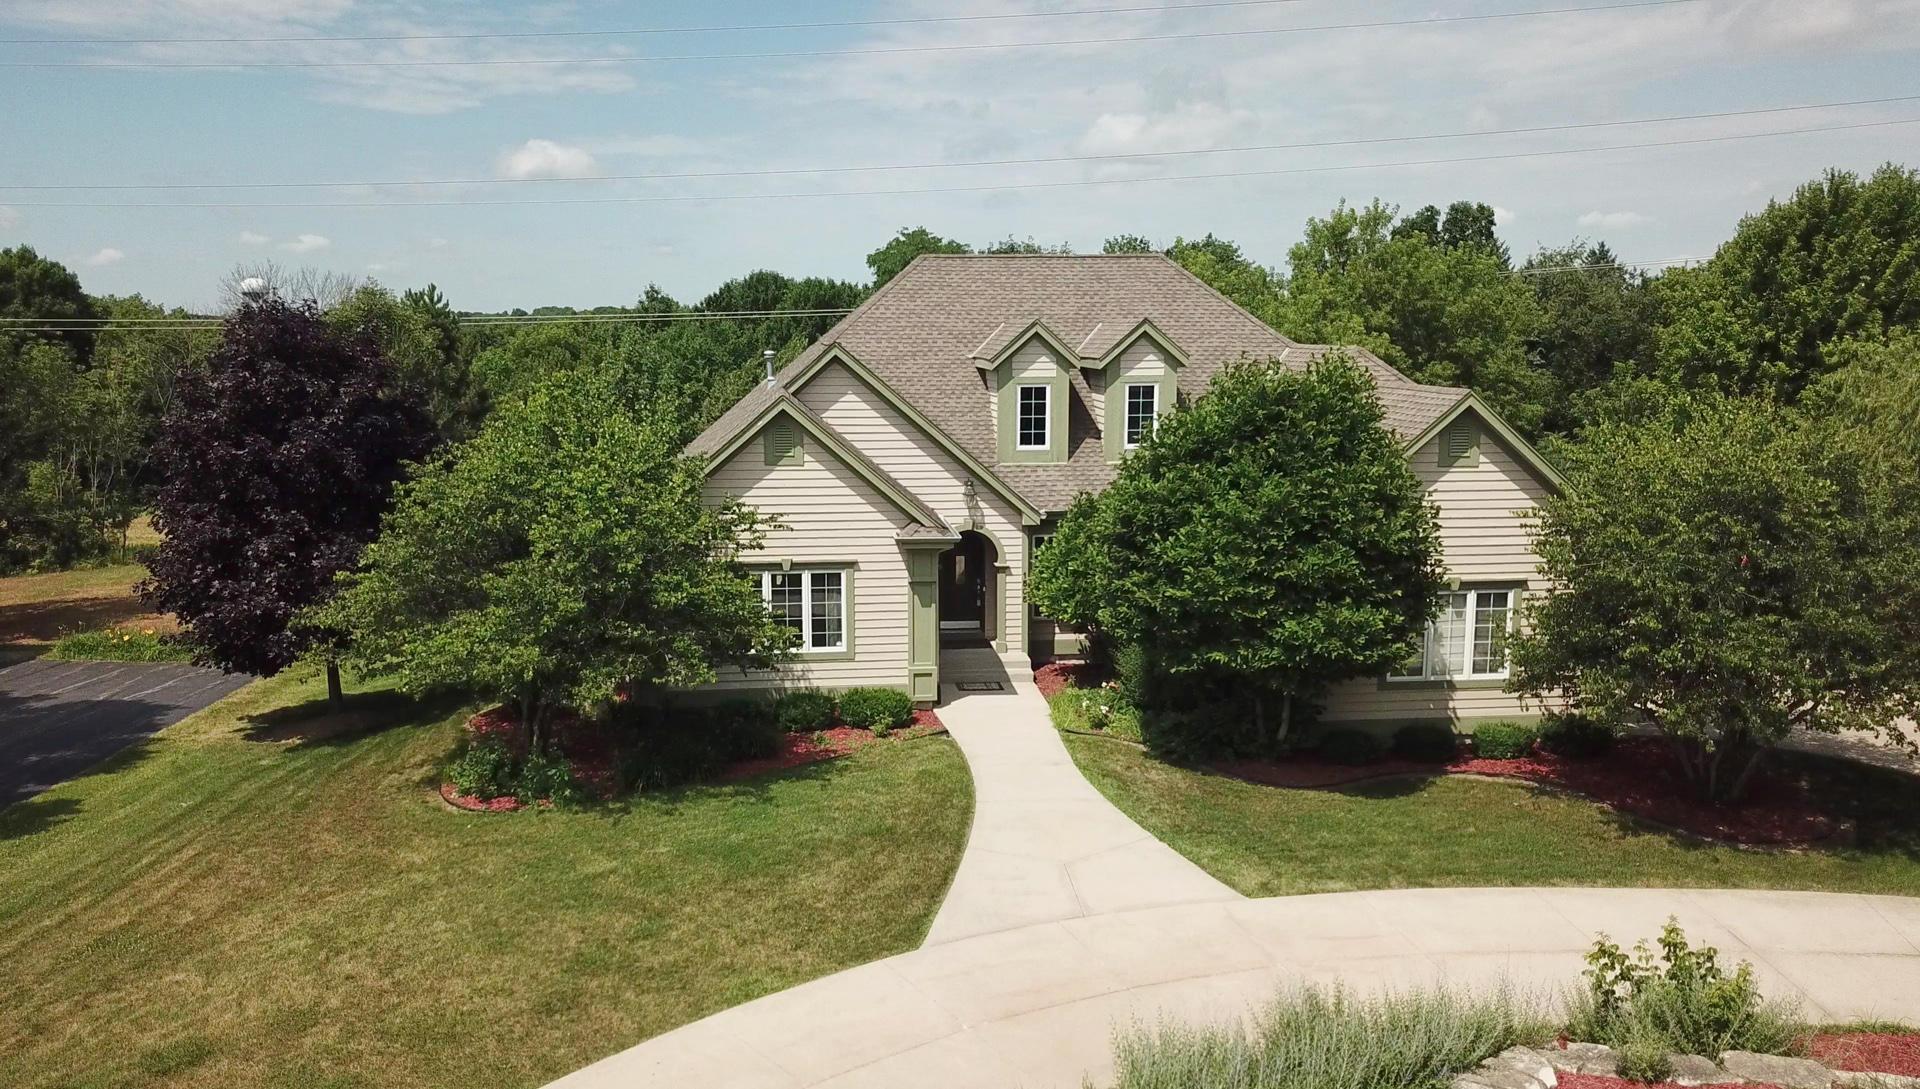 1505 Brian Ct, Brookfield, Wisconsin 53045, 5 Bedrooms Bedrooms, 10 Rooms Rooms,5 BathroomsBathrooms,Single-Family,For Sale,Brian Ct,1648860